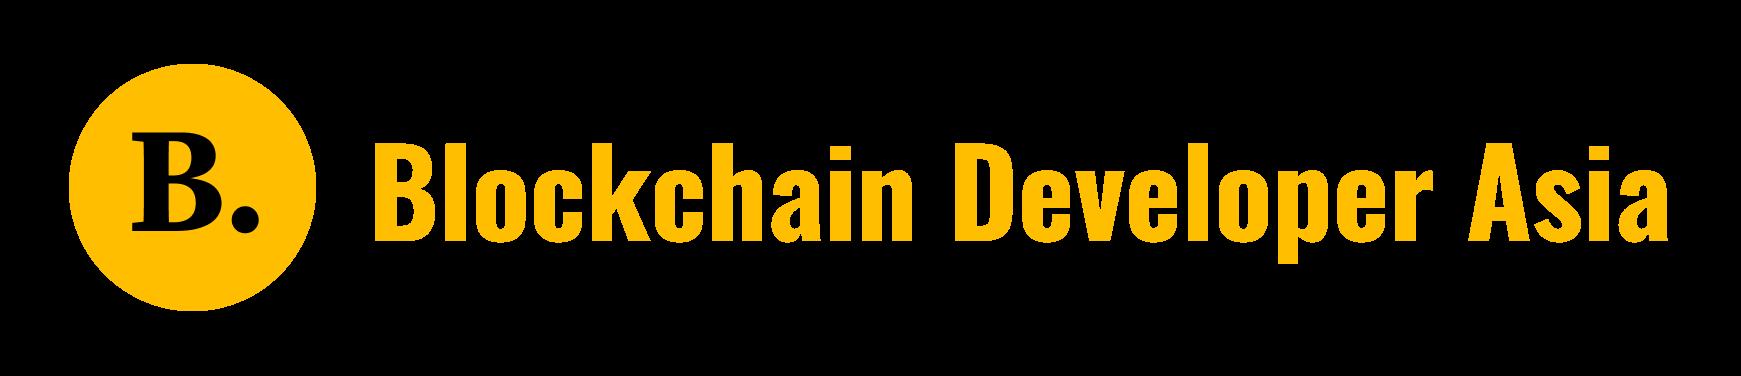 Blockchain Developer Asia | Blockchain Developer Asia